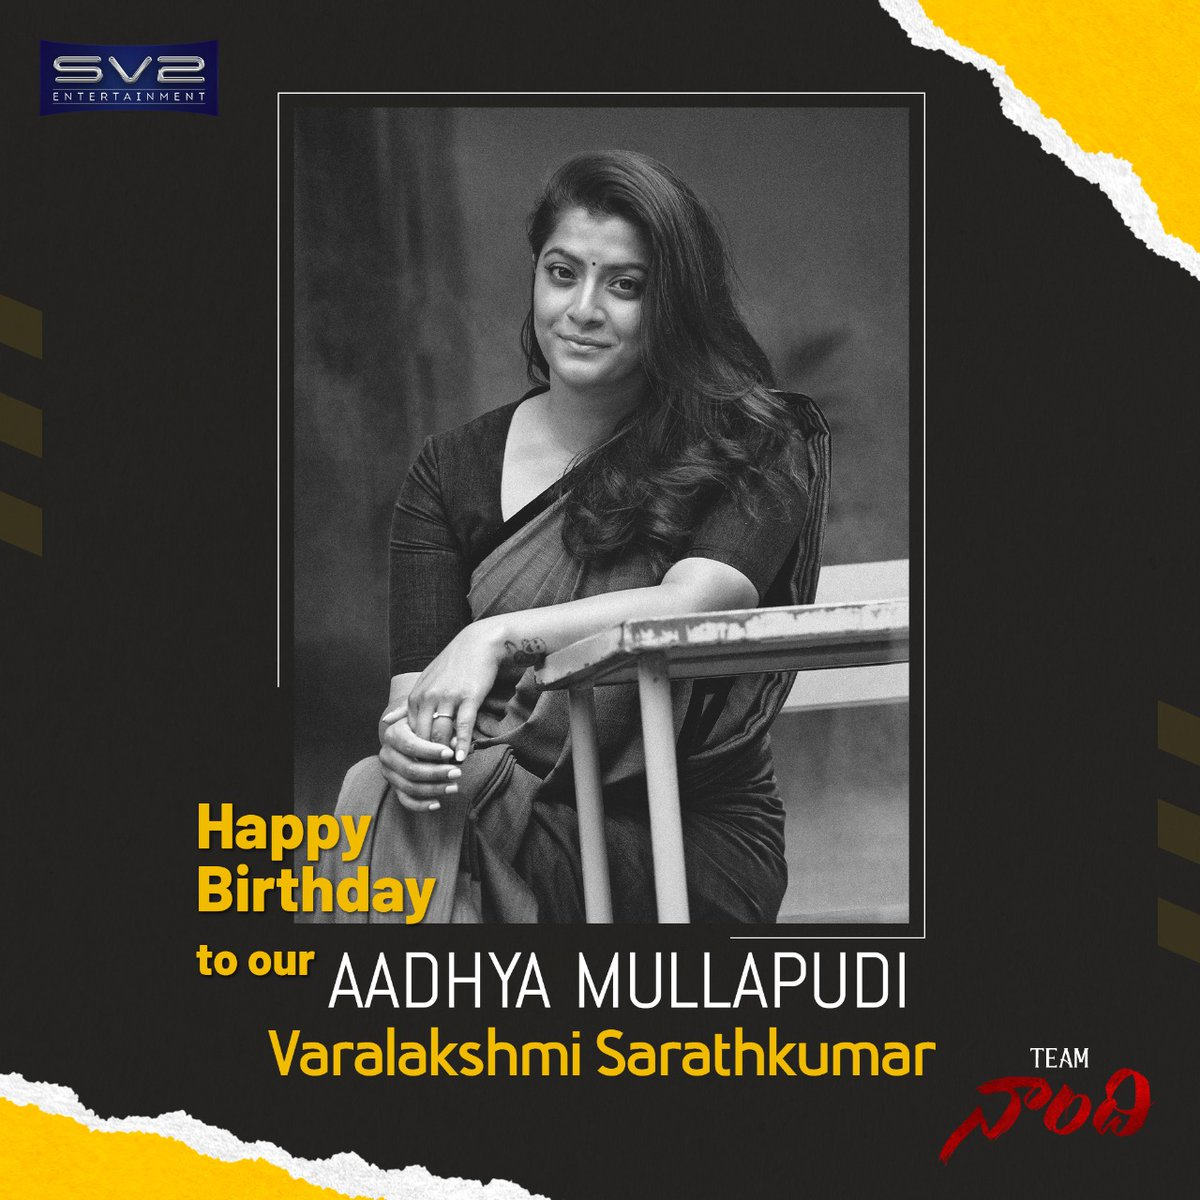 Happy birth day to our AADHYA MULLAPUDI @varusarath5